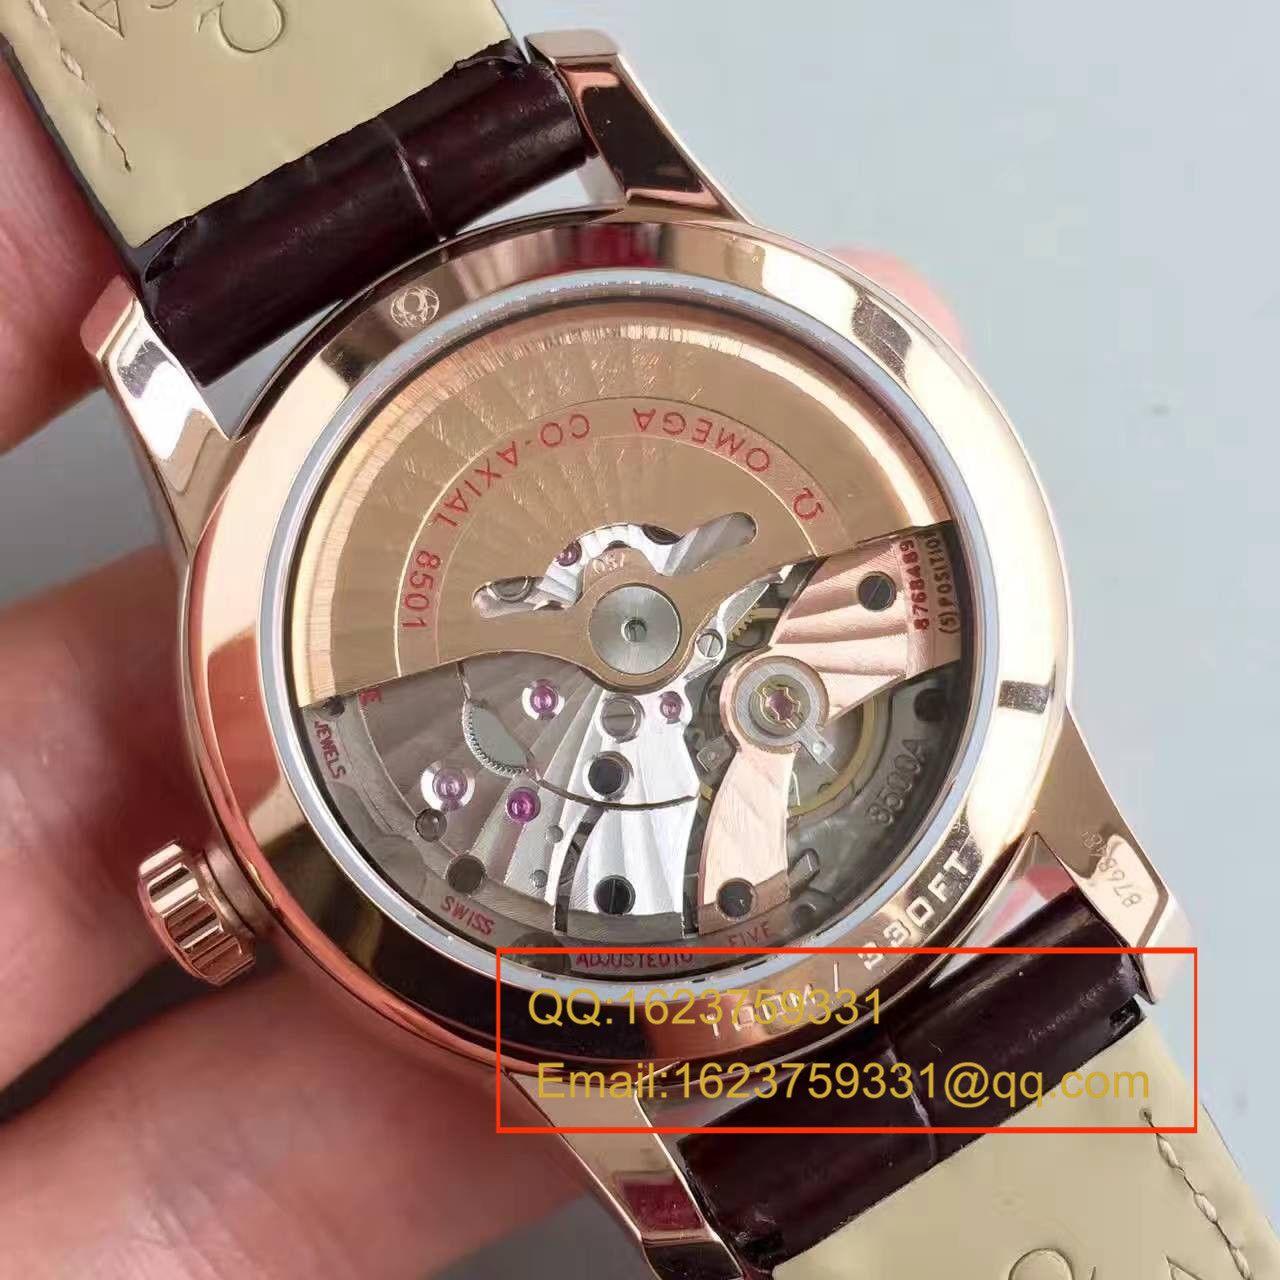 【SSS厂顶级复刻手表】欧米茄碟飞系列431.53.41.21.13.001腕表 / M273